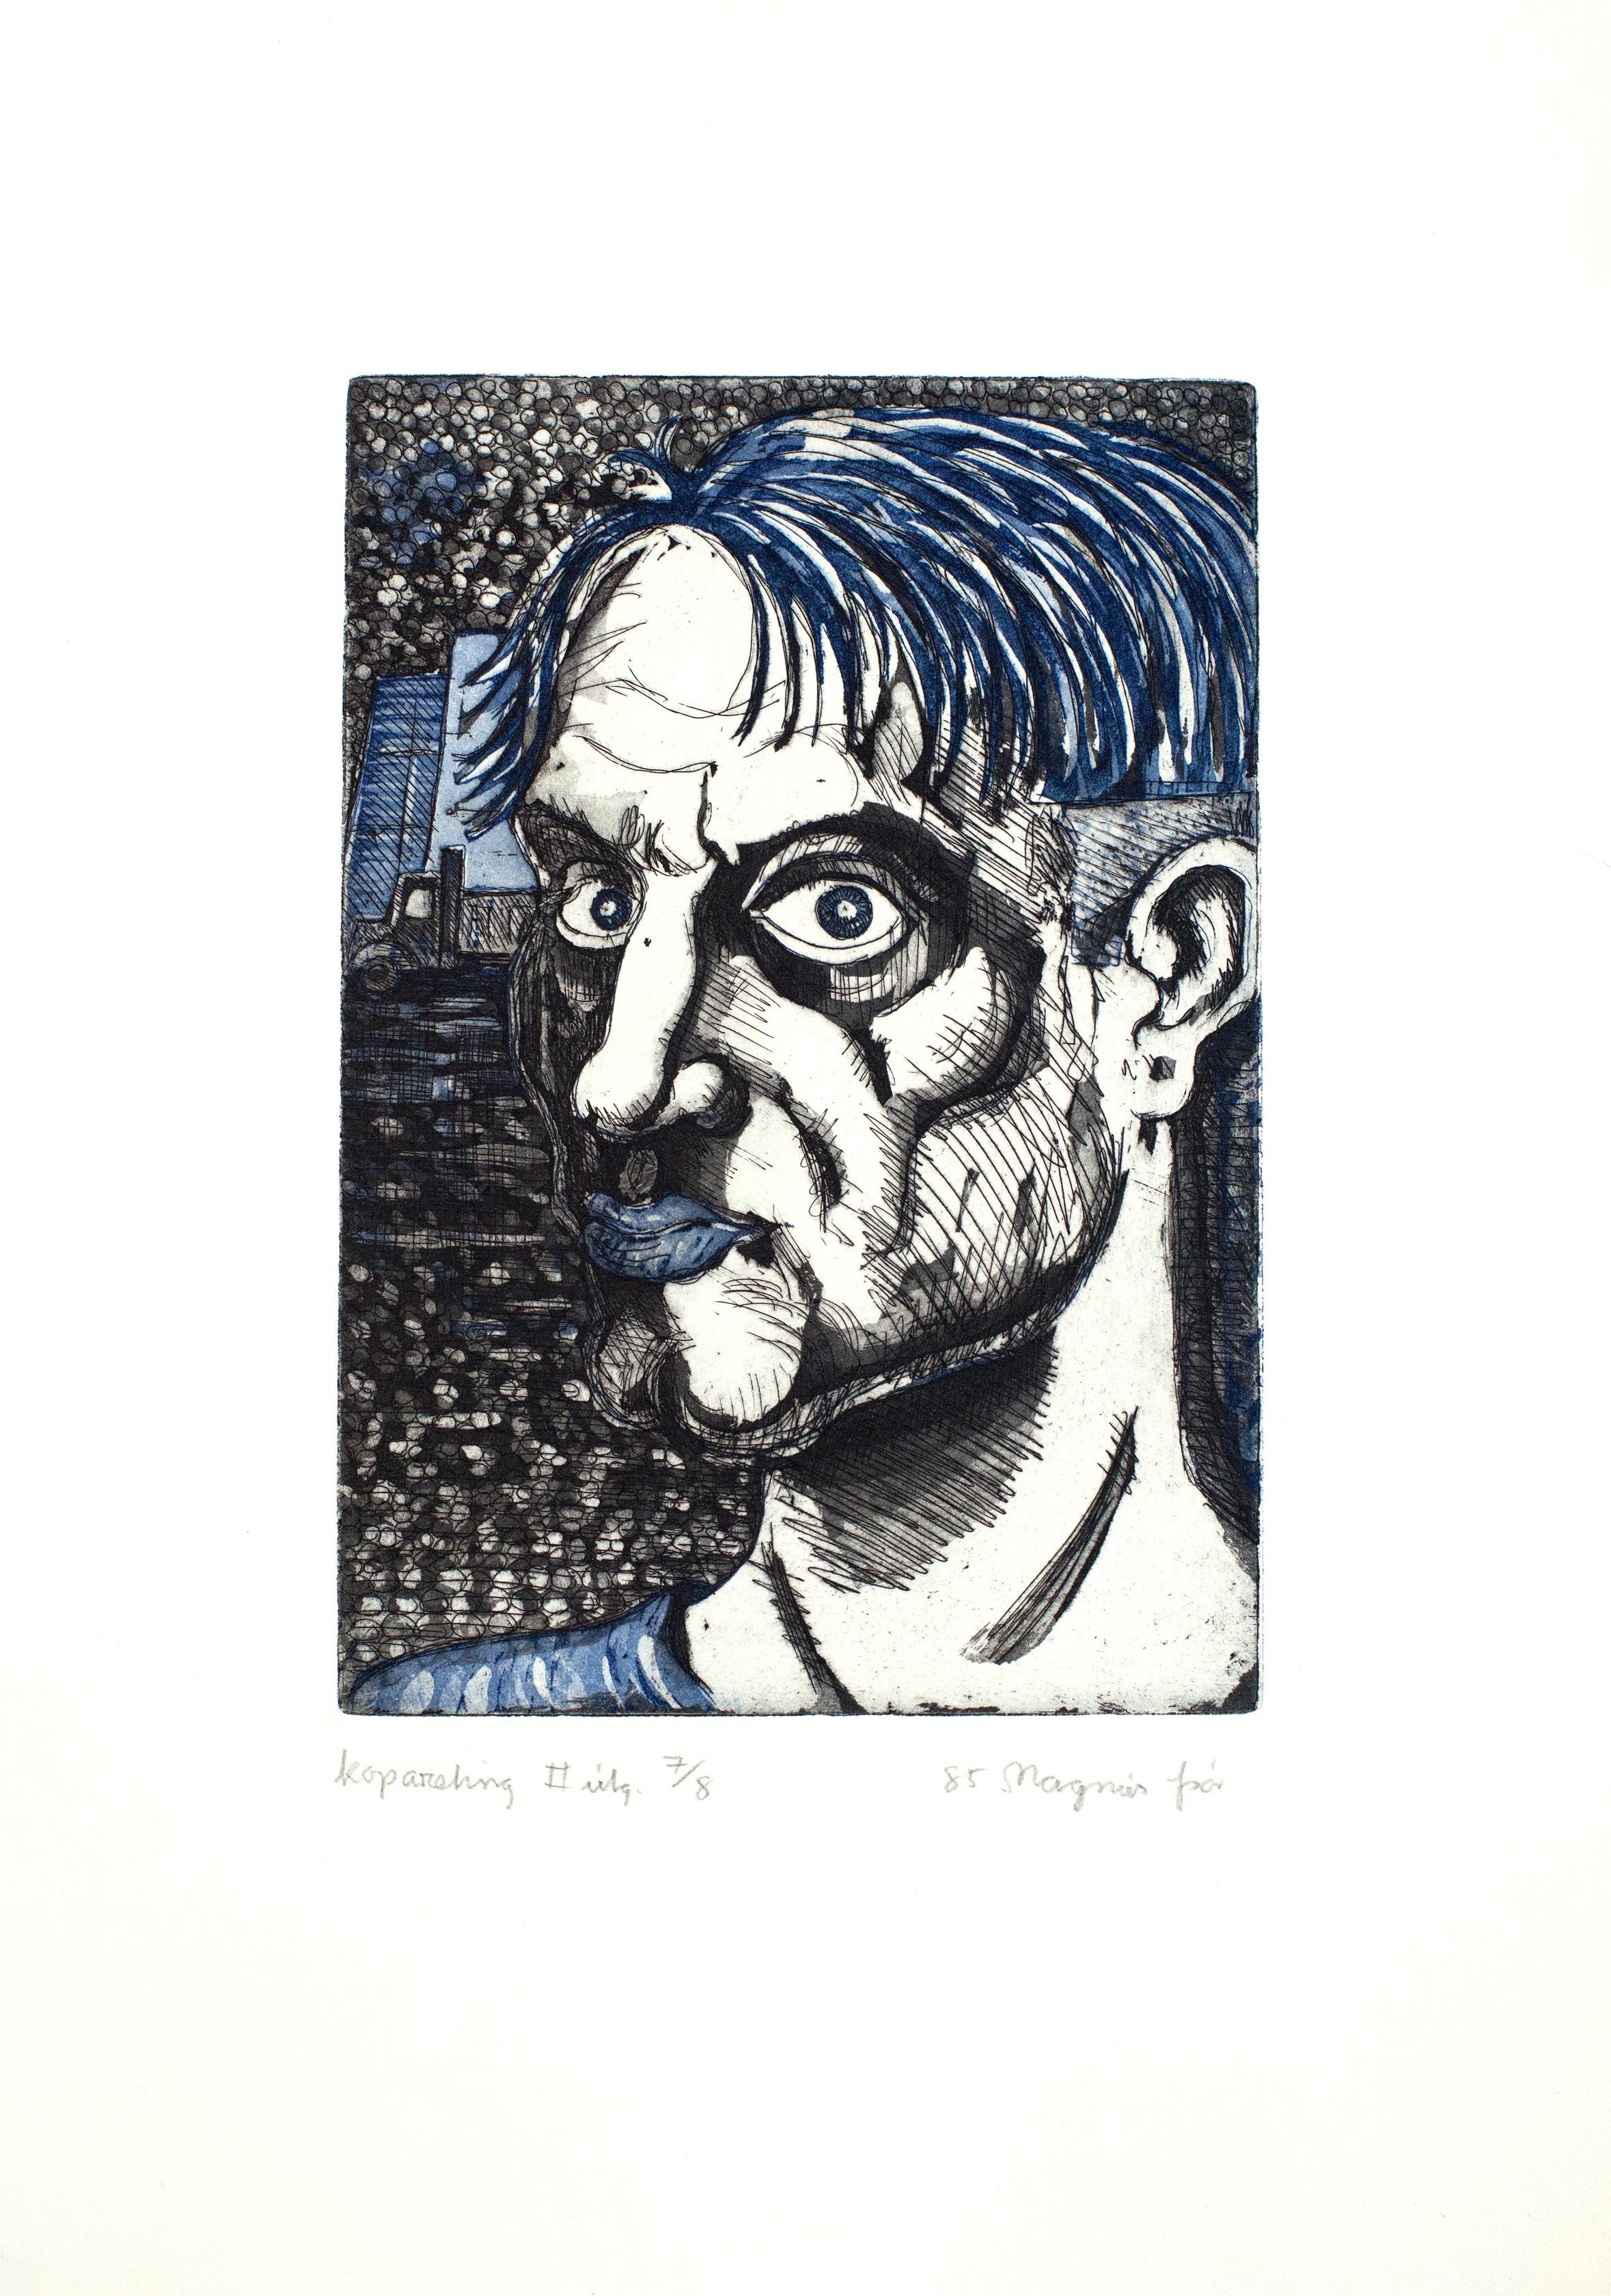 Magnús Þór Jónsson (Megas) Self-Portraits (Sjálfsmyndir), 1985 Series of 16 etchings Sheet: 14 7/8 x 11 in. (37.8 x 27.9 cm) Printed by Ingibjörg Jóhannsdóttir; published by the artist. Edition: 8 (2nd edition) (c)Magnús Þór Jónsson